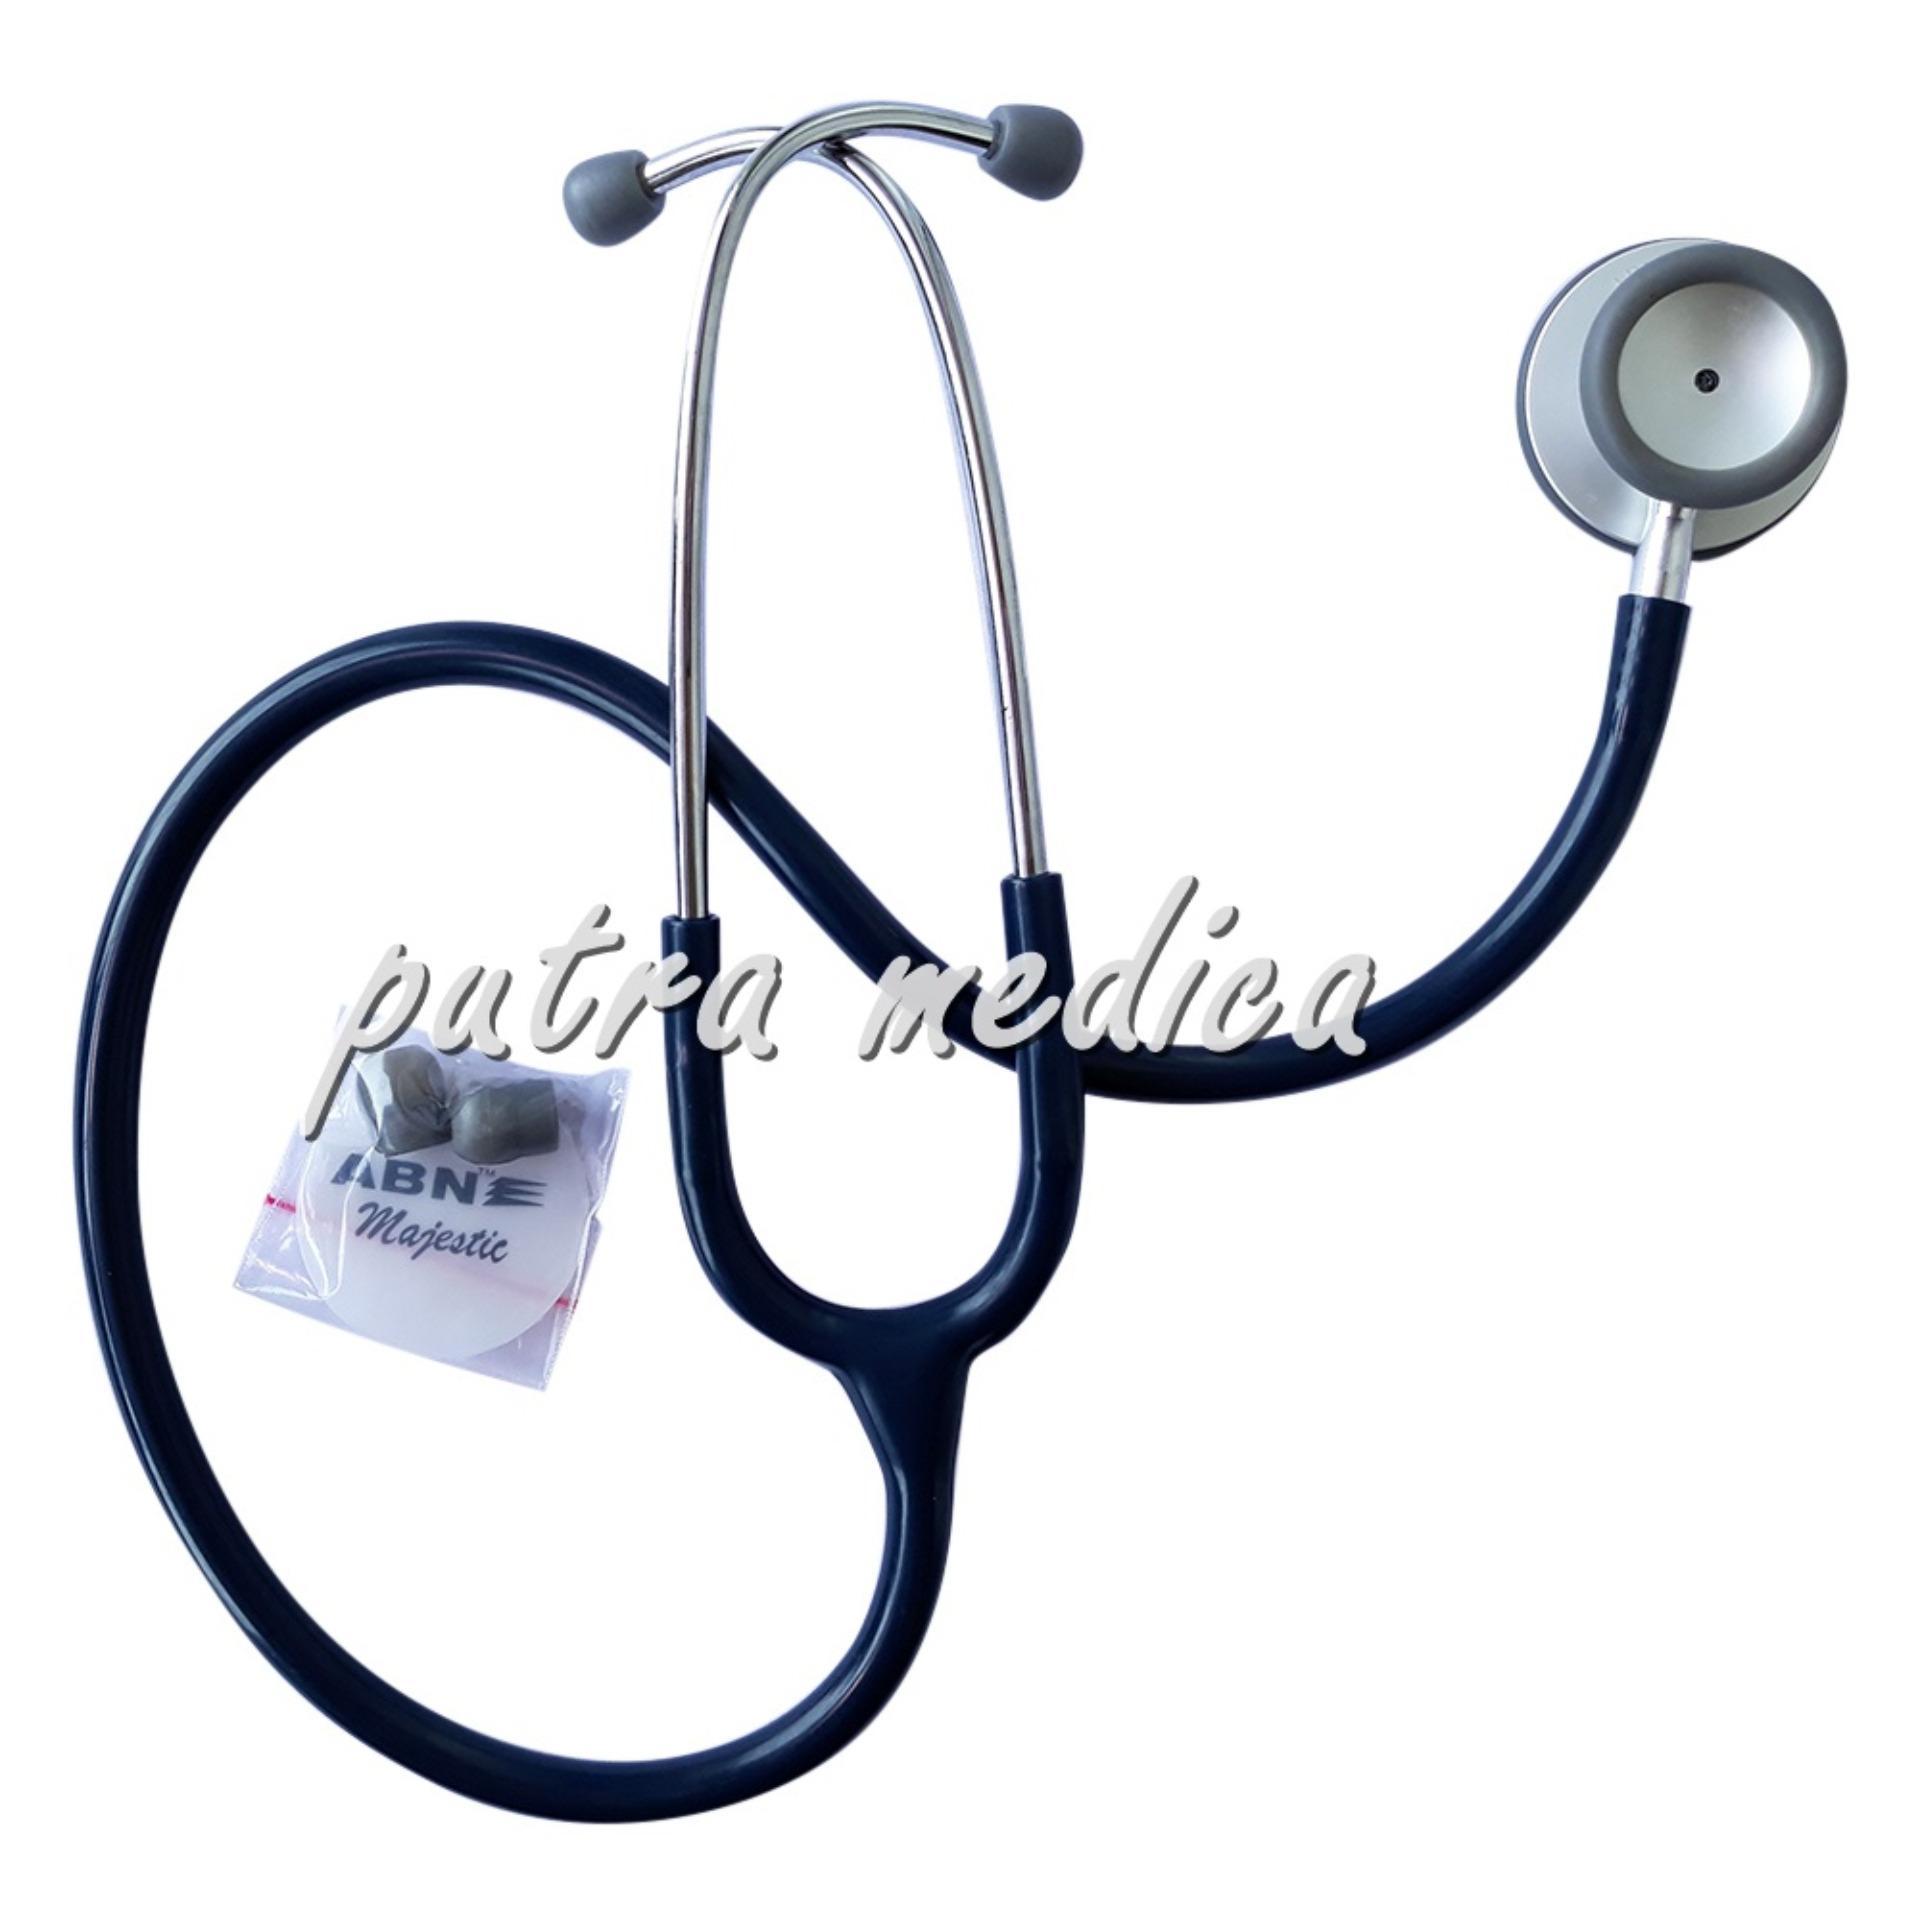 Miliki Segera Putra Medica Abn Stetoskop Majestic Navy Blue Alat Kedokteran